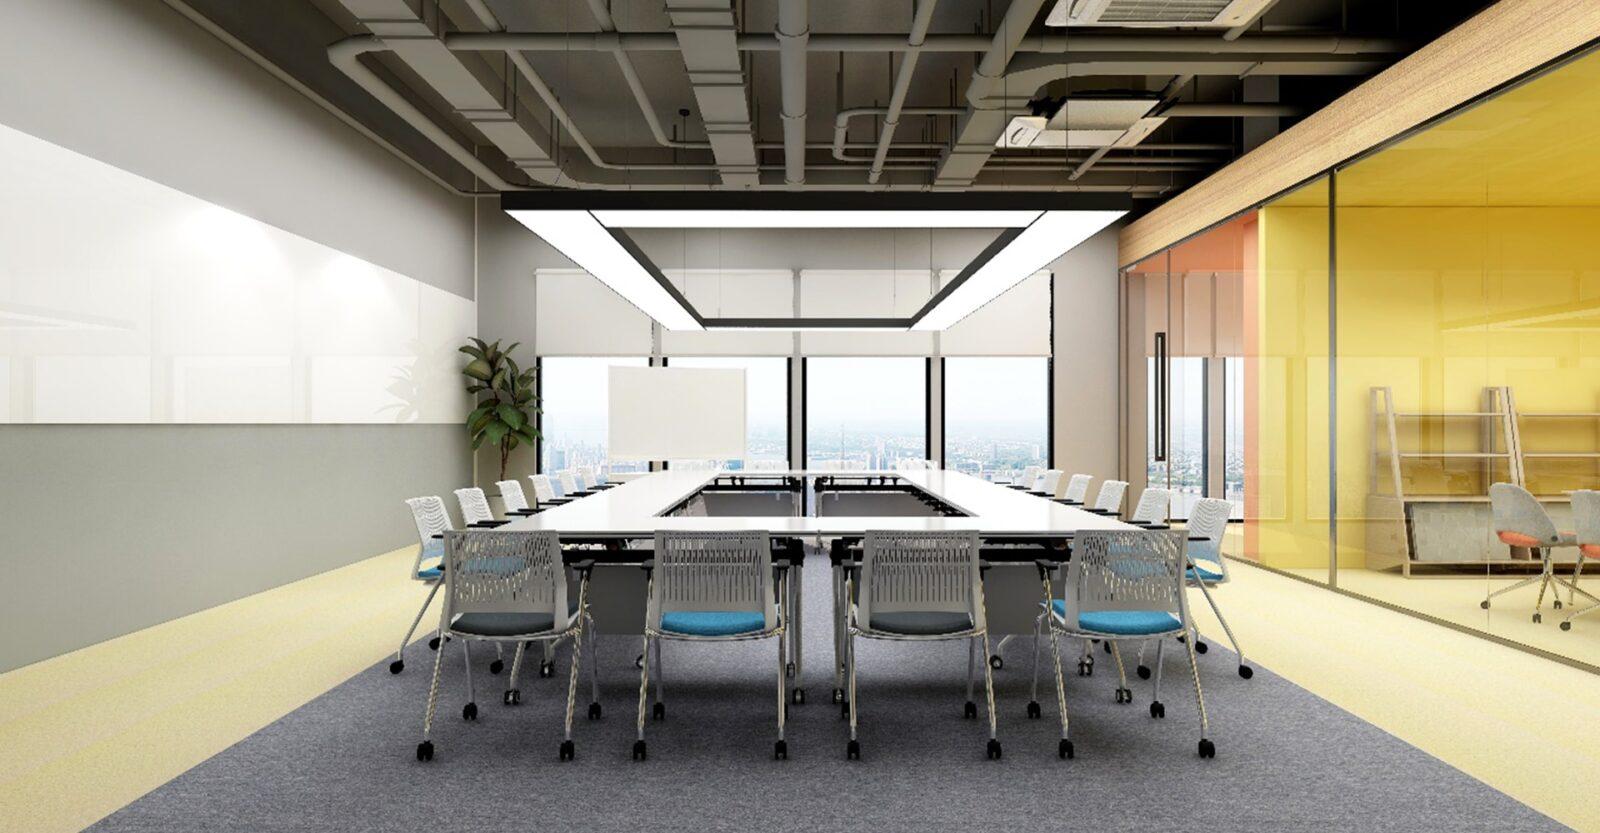 Training Room Furniture | Meeting Room Furniture